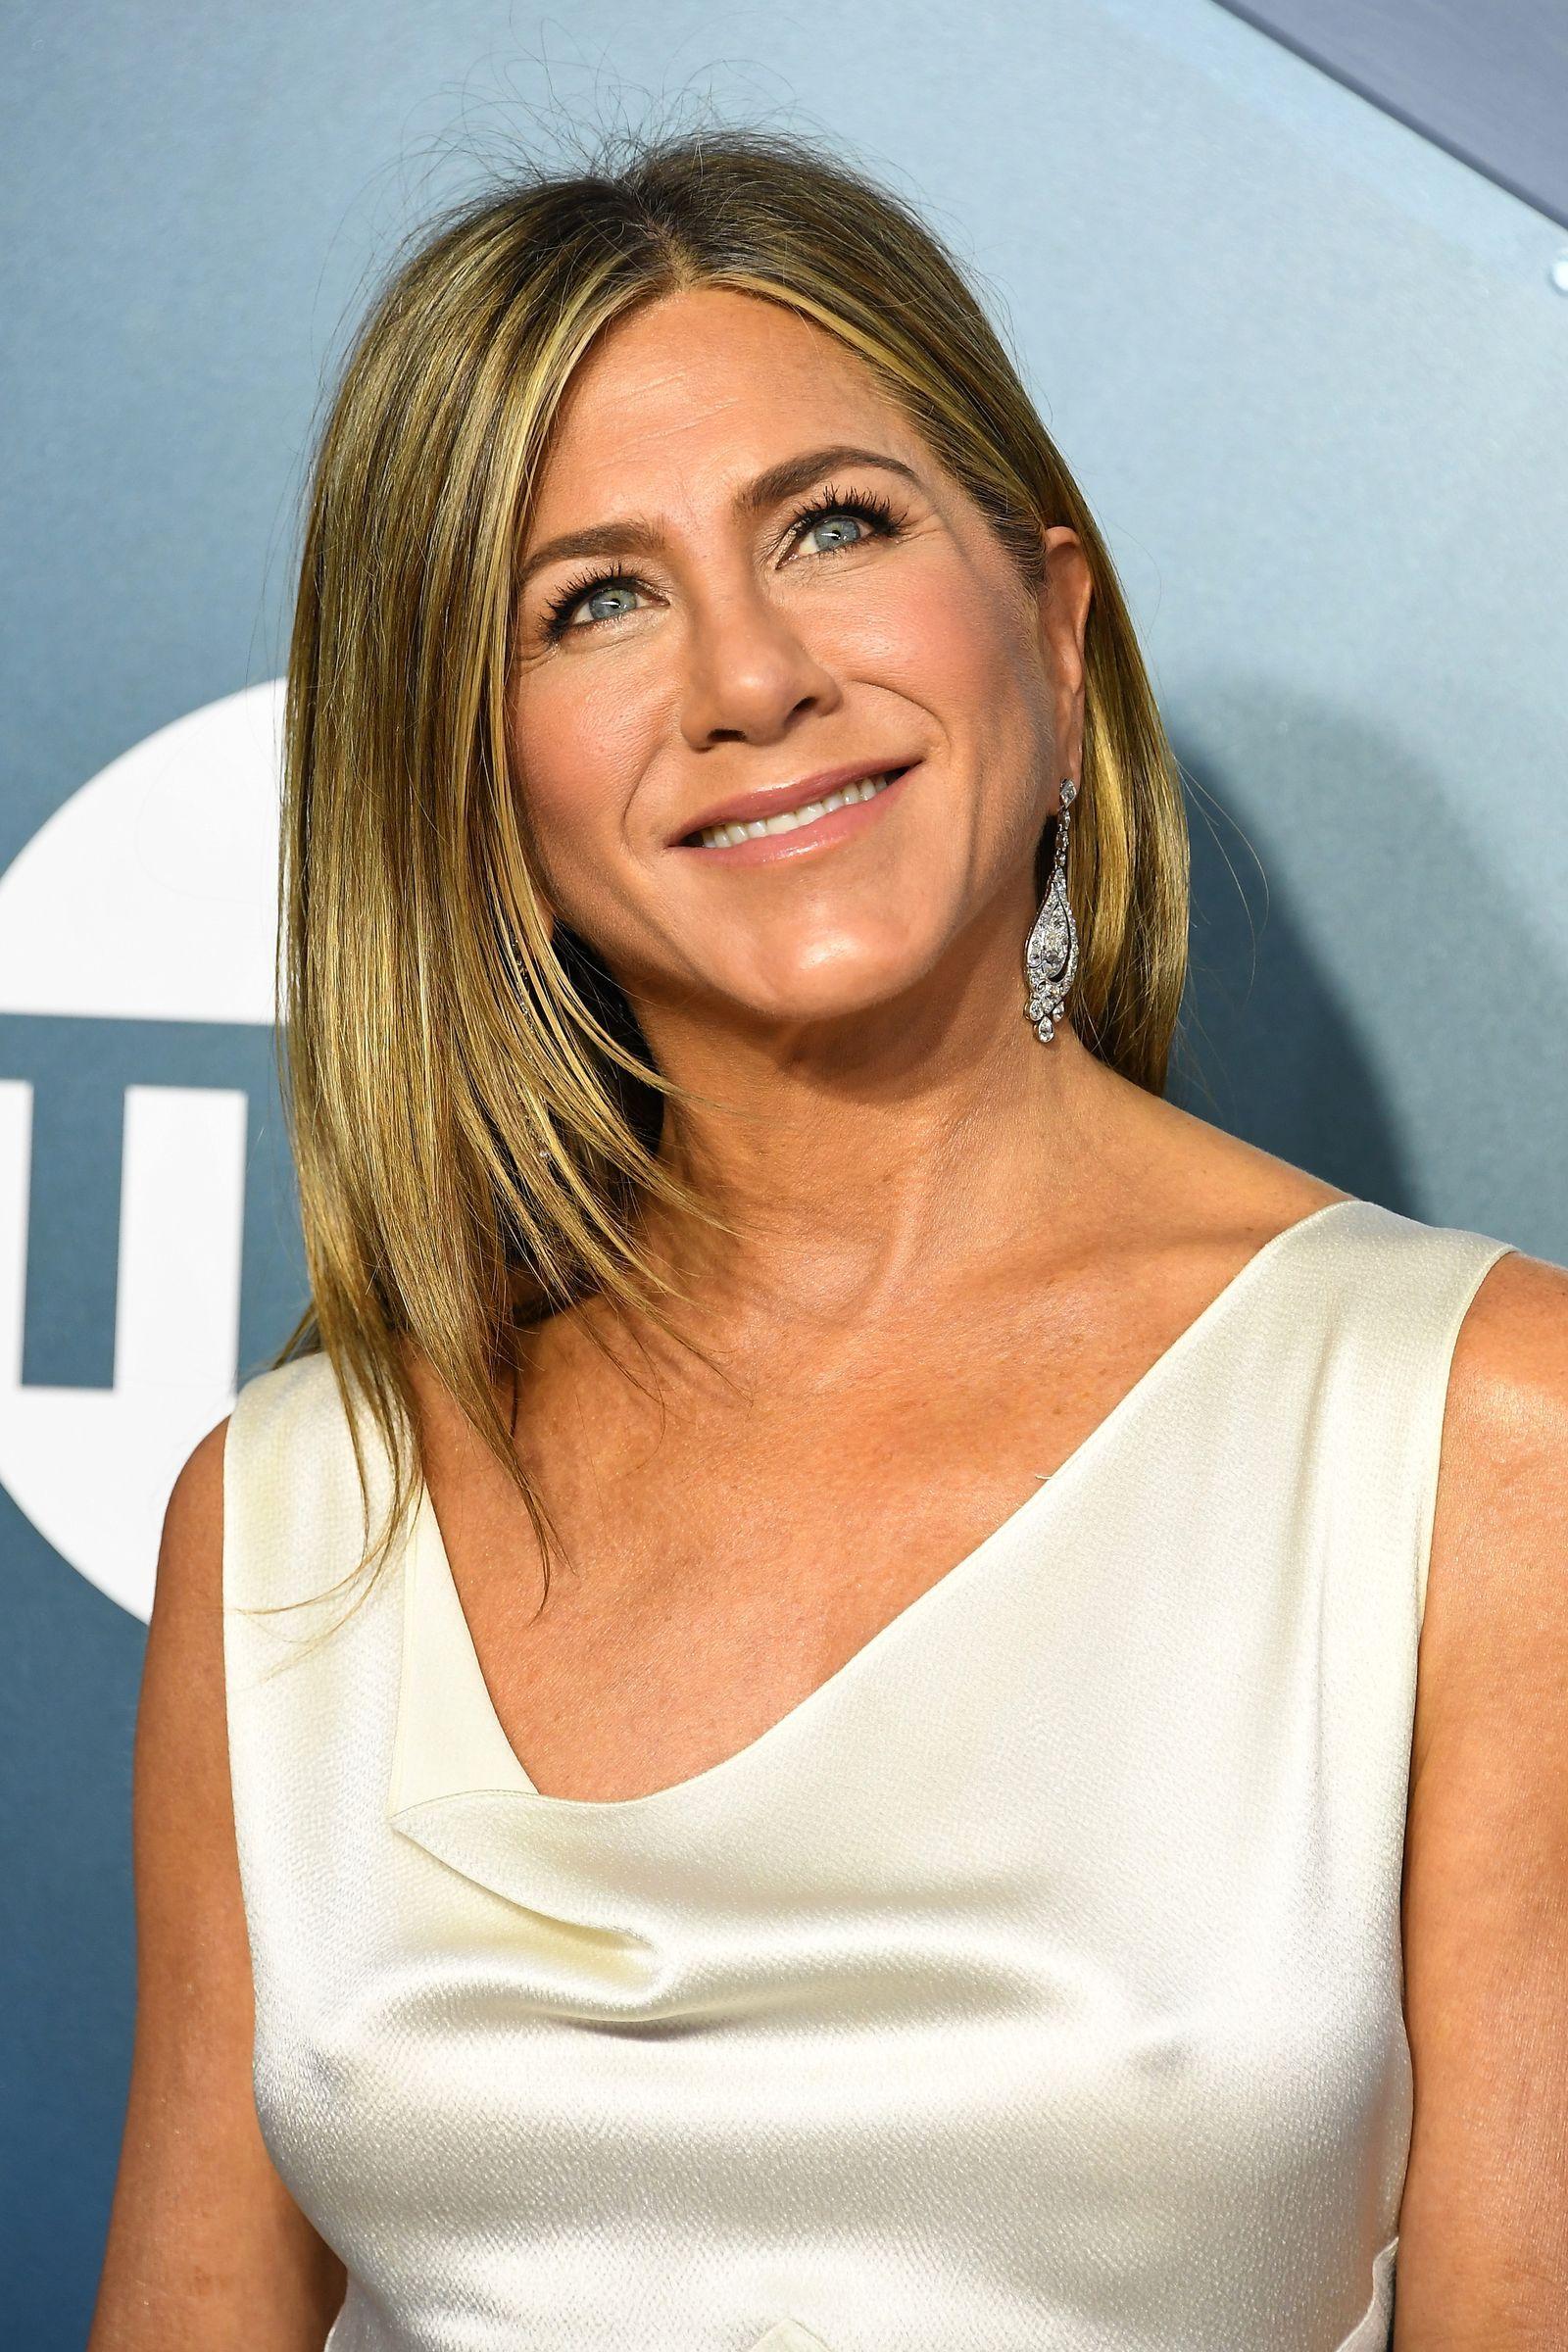 Friends 25th Anniversary: See How Jennifer Aniston